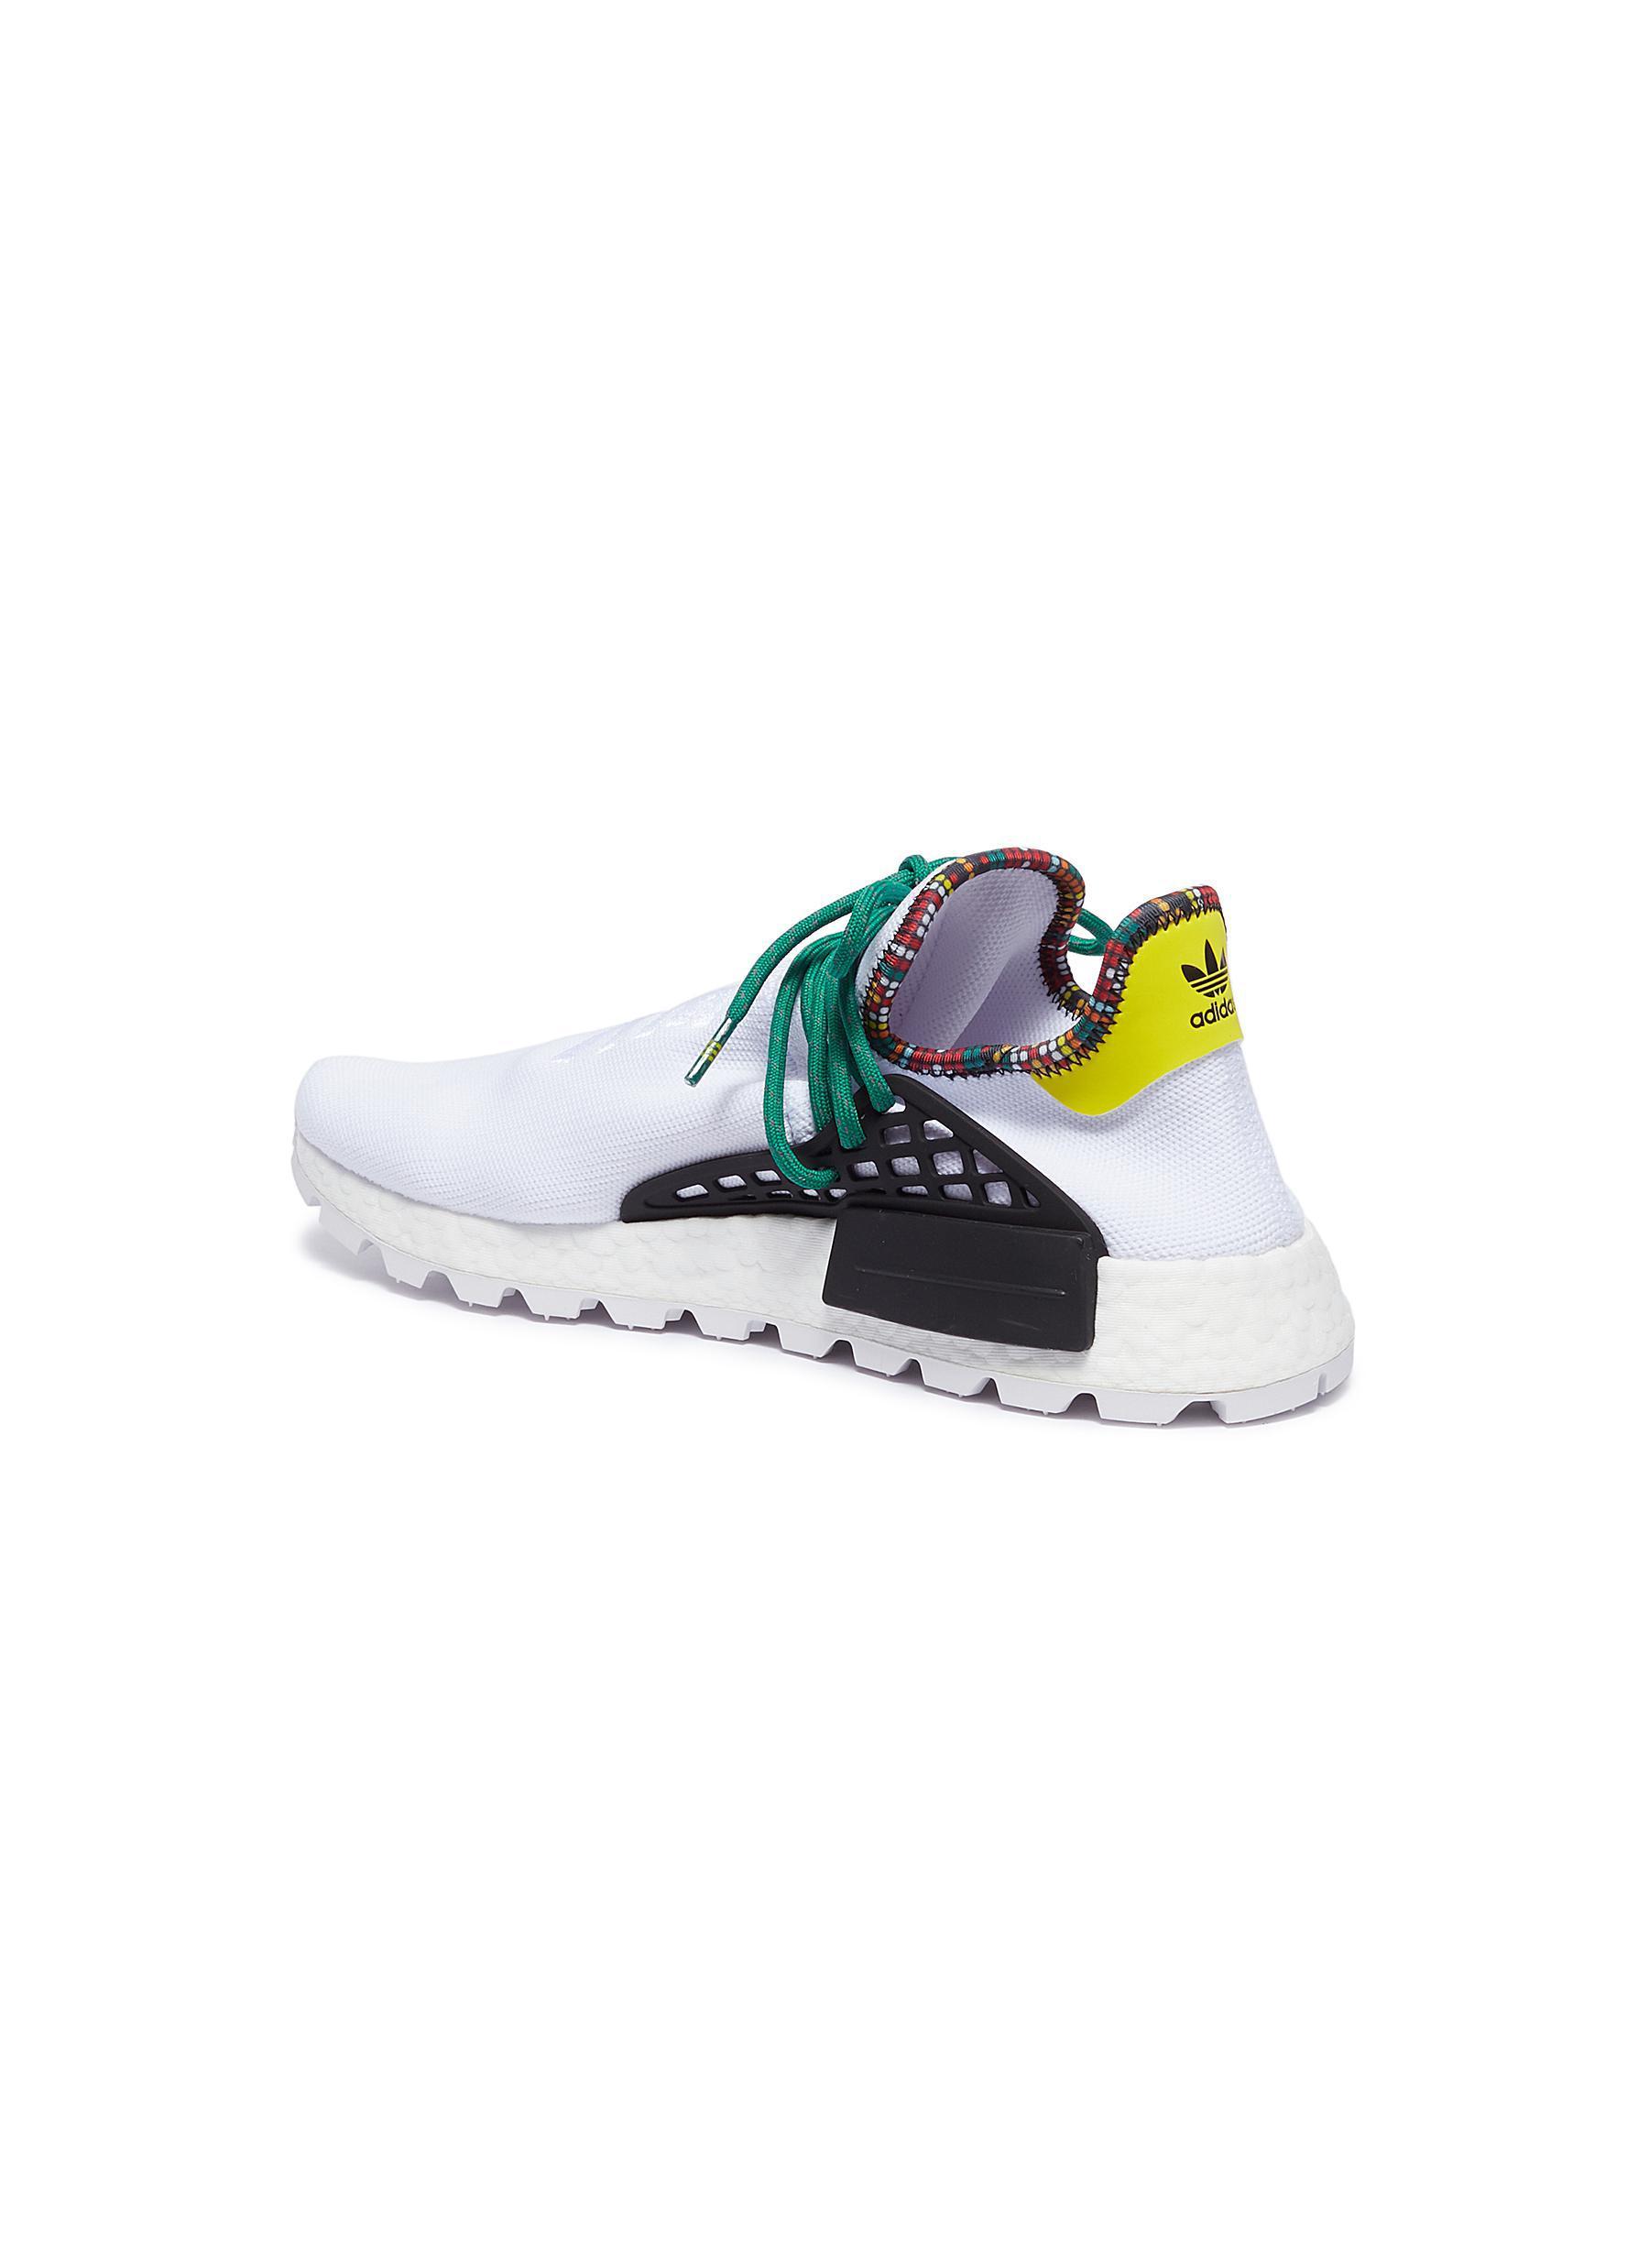 688b35b5fe46e Adidas Originals - White  solarhu Nmd  Slogan Embroidered Primeknit Sneakers  for Men - Lyst. View fullscreen